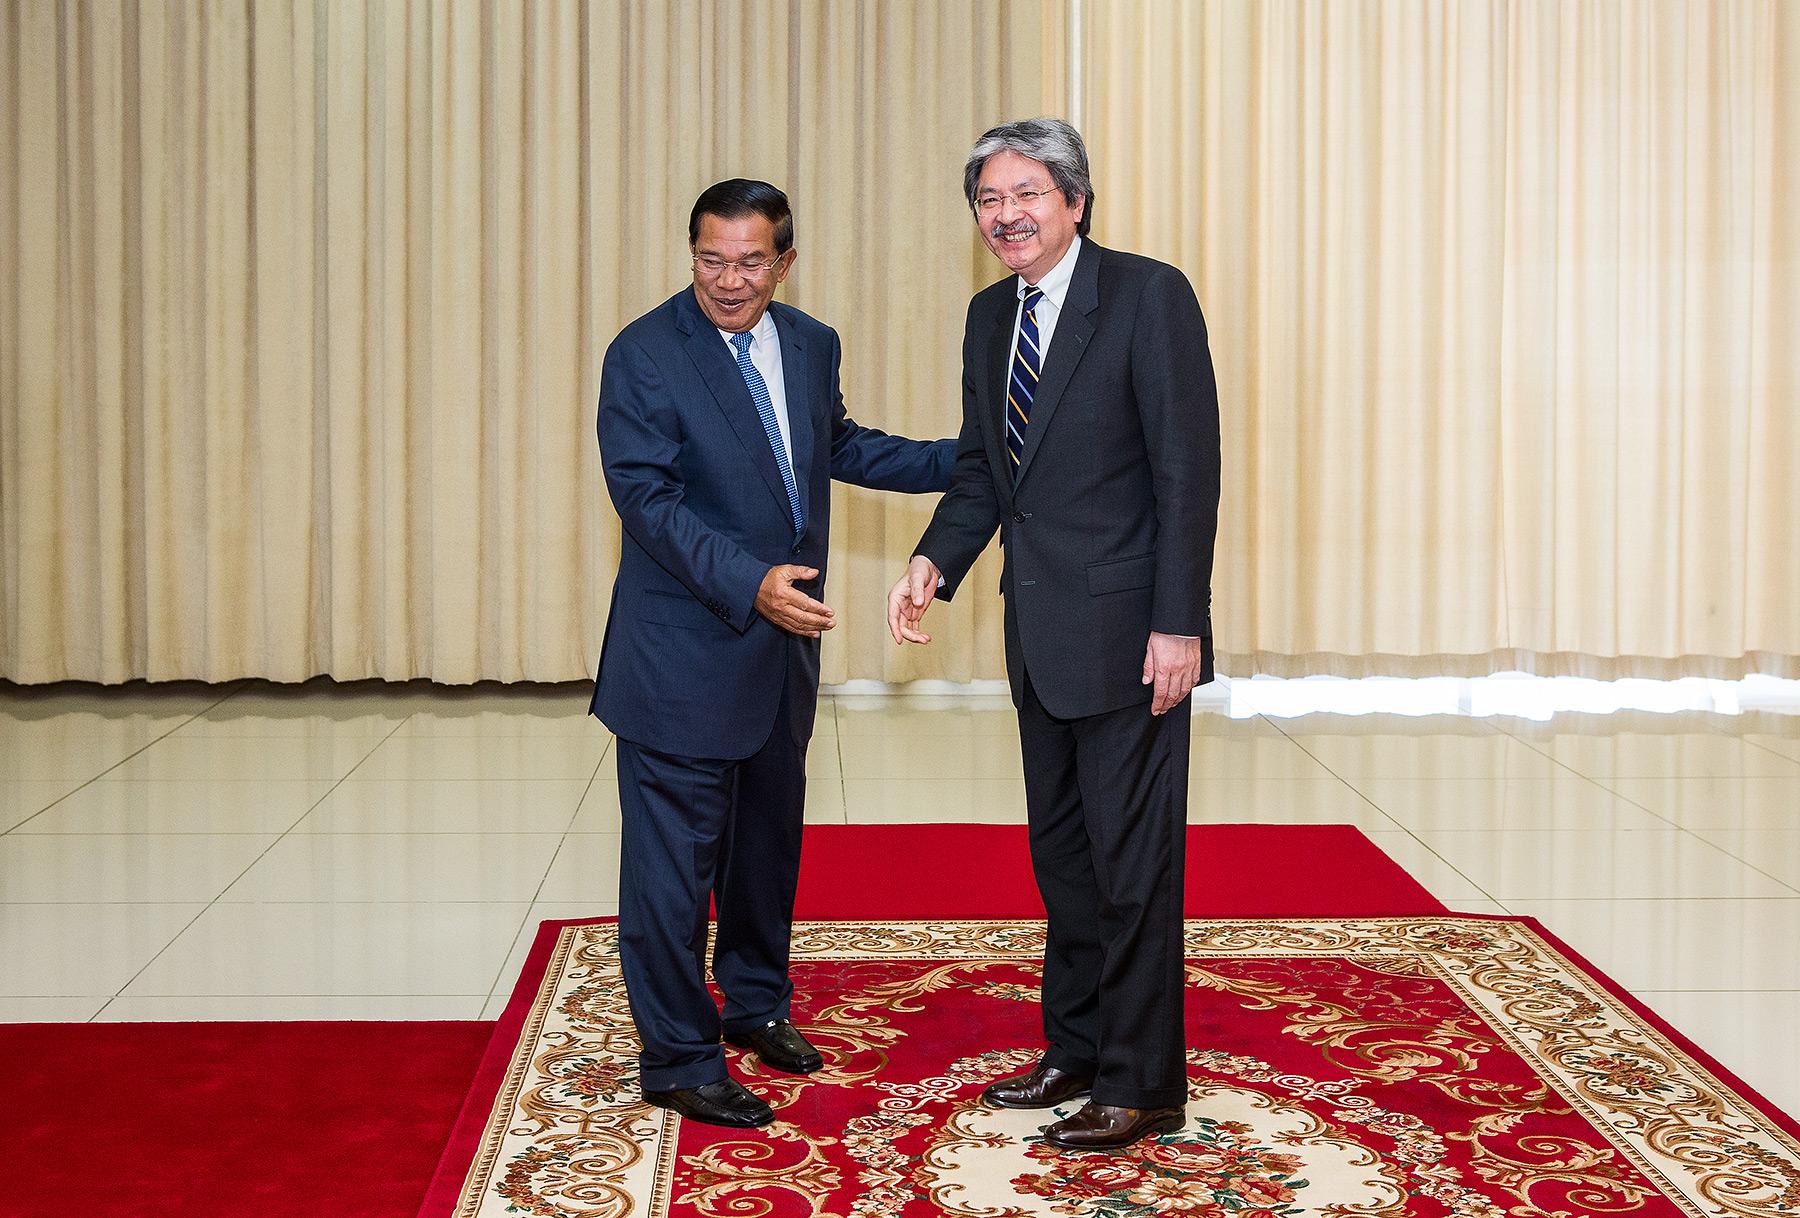 Prime Minister Hun Sen and Hong Kong Minister of Finance, Peace Palace Phnom Penh